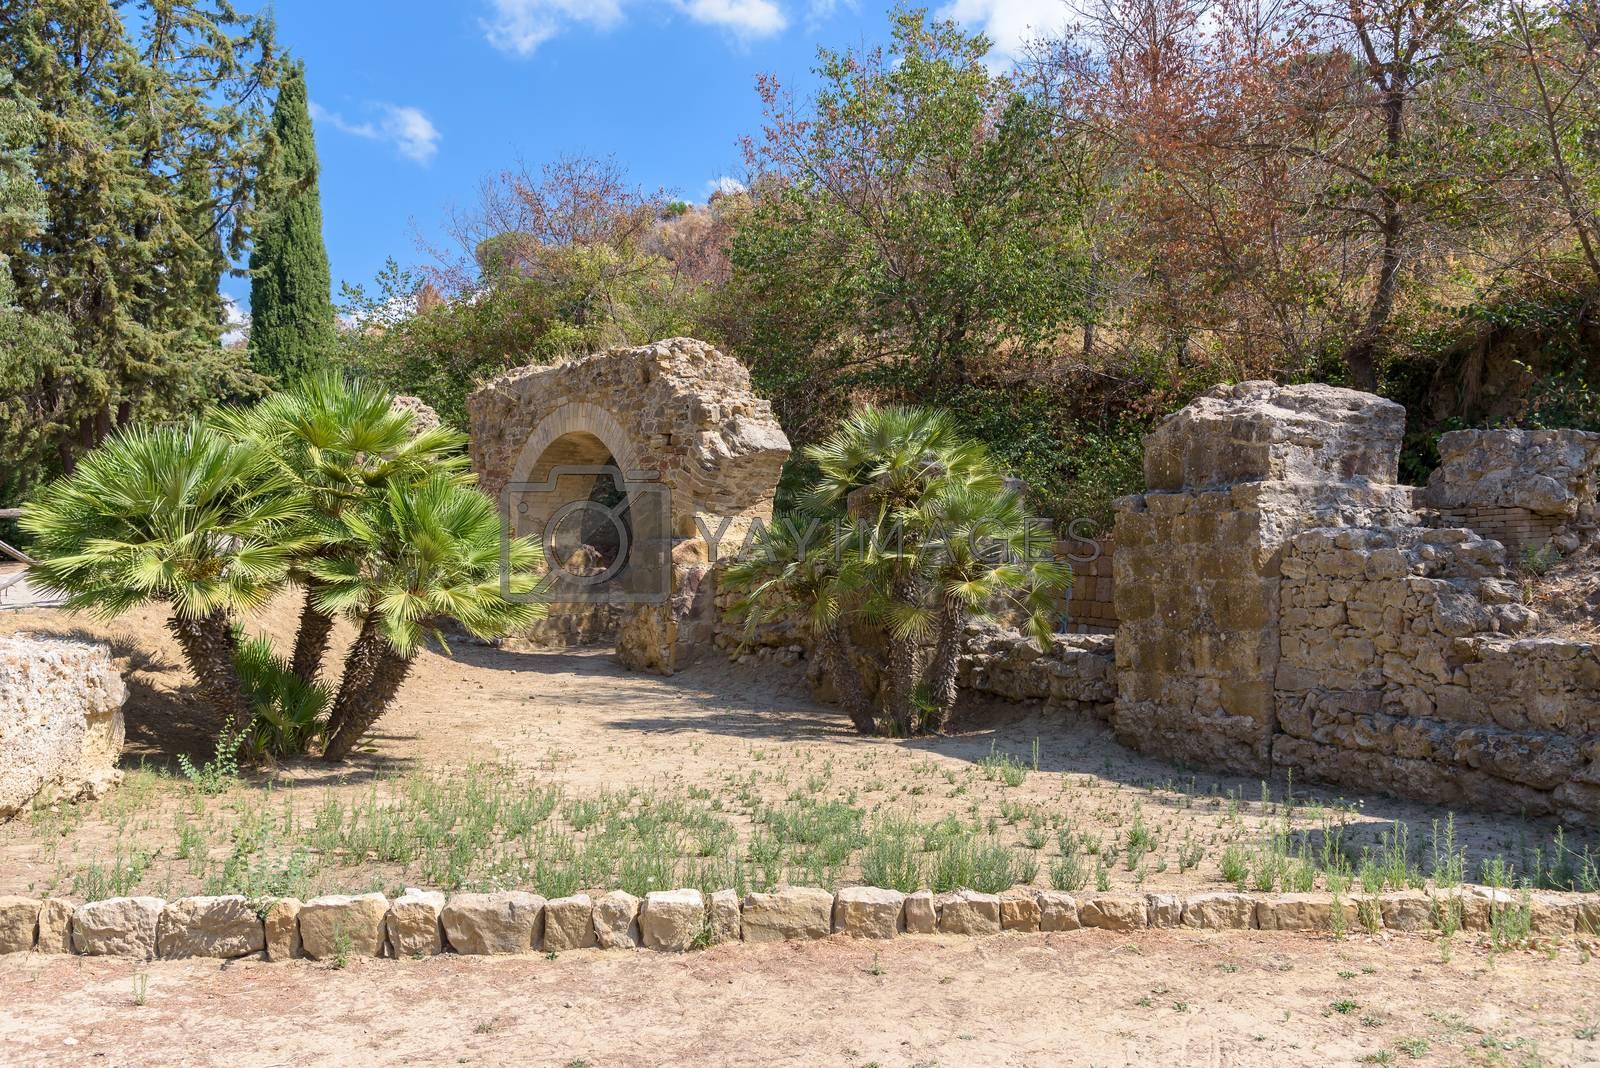 Ruins of the ancient Villa del Casale near Piazza Armerina town on Sicily, Italy